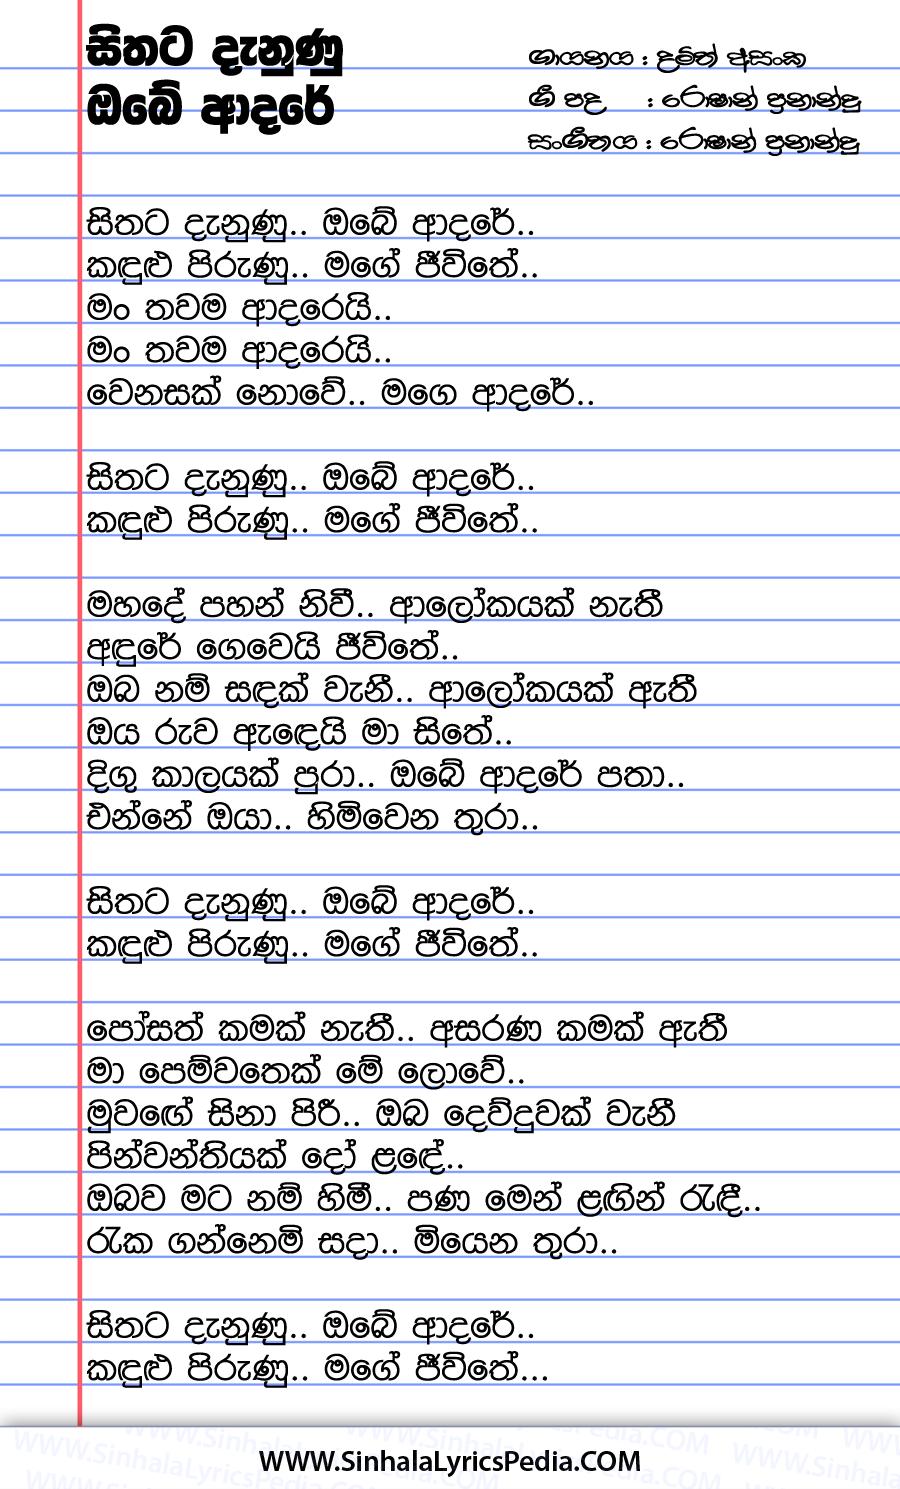 Sithata Danunu Obe Adare Song Lyrics